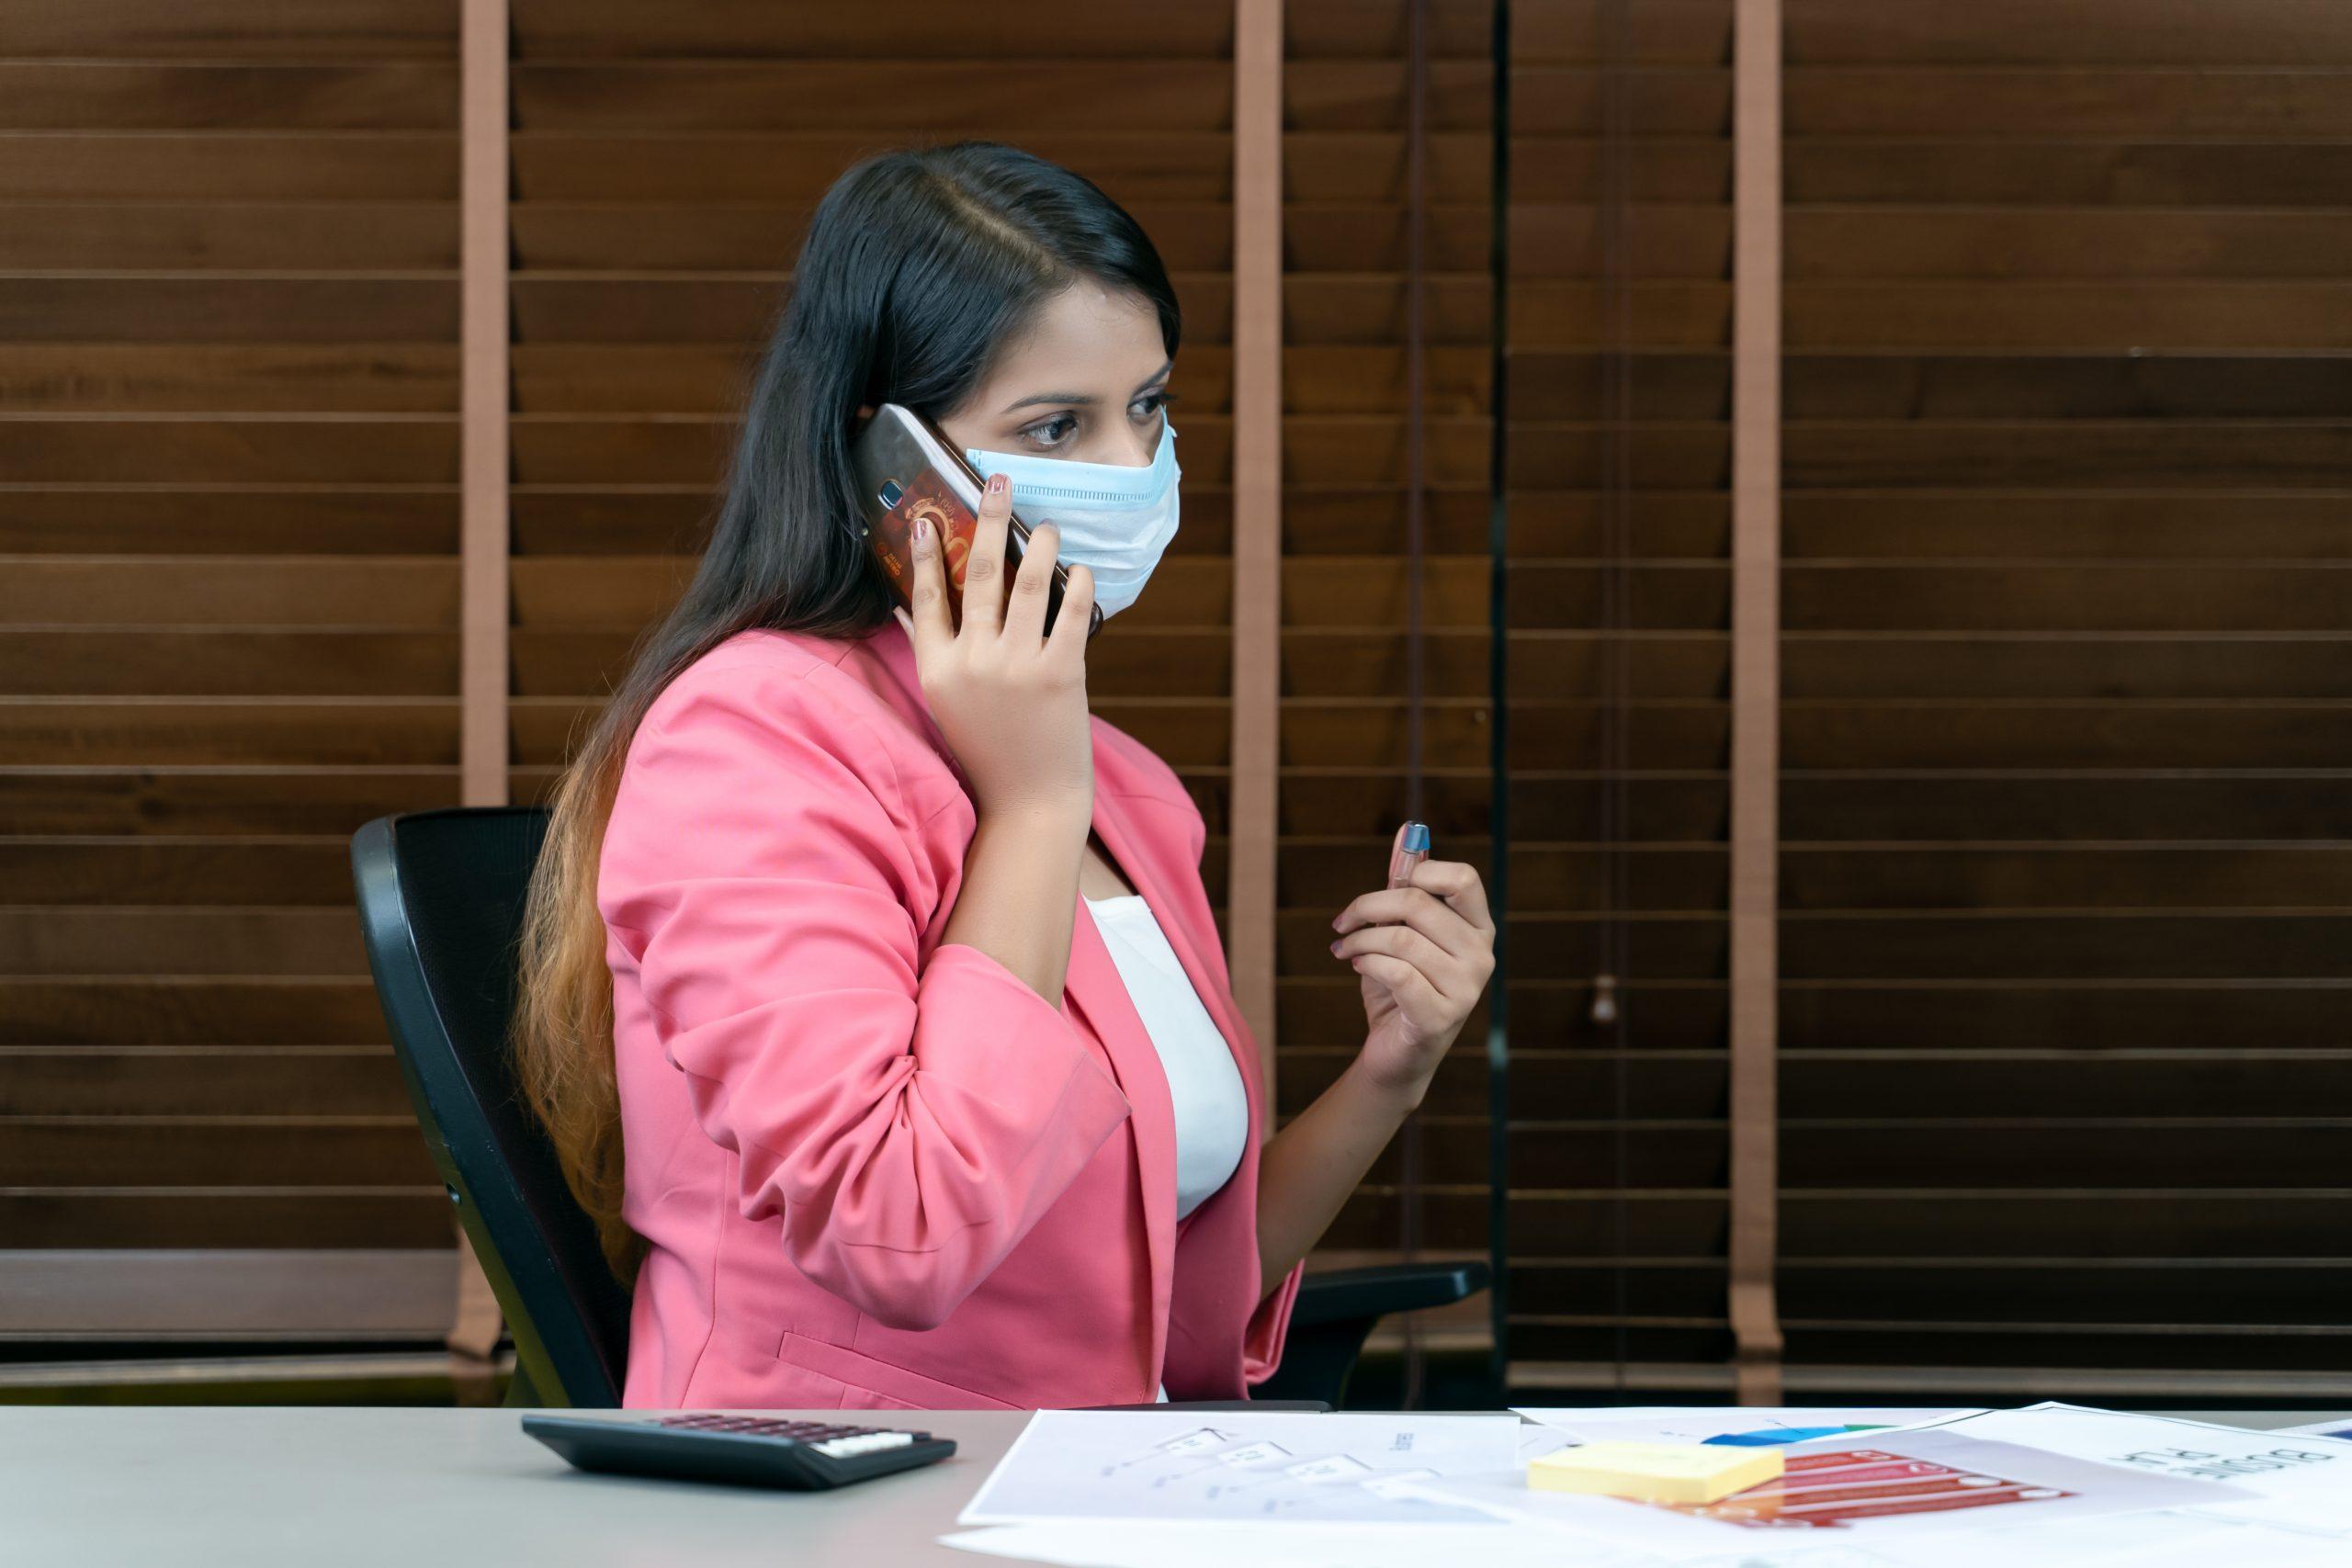 Employee talking on call in office